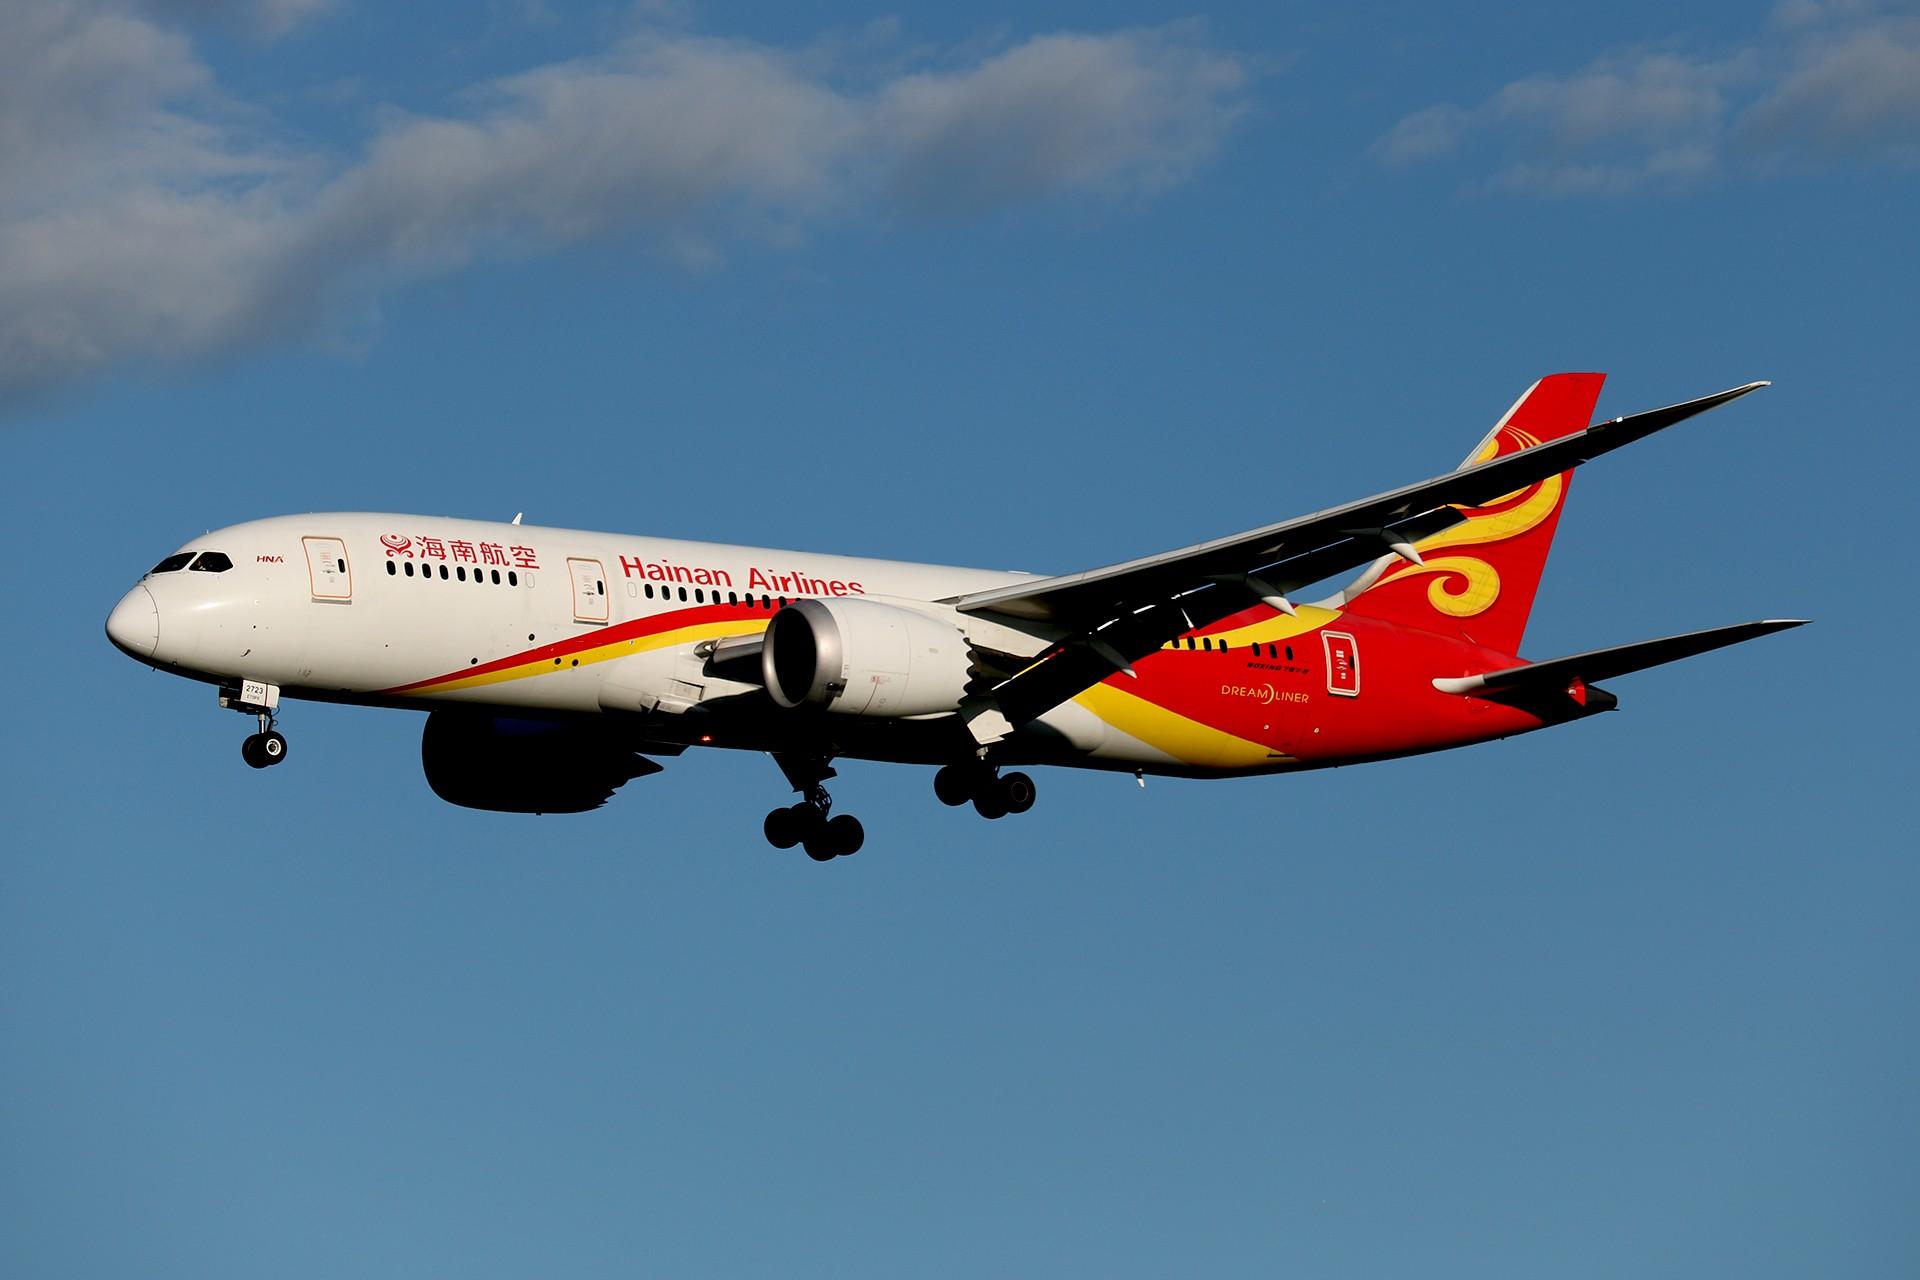 Re:[原创]LIULIU 【PEK 01】 好看的云Ⅳ 杂,很杂,是真的杂 BOEING 787-8 B-2723 中国北京首都国际机场